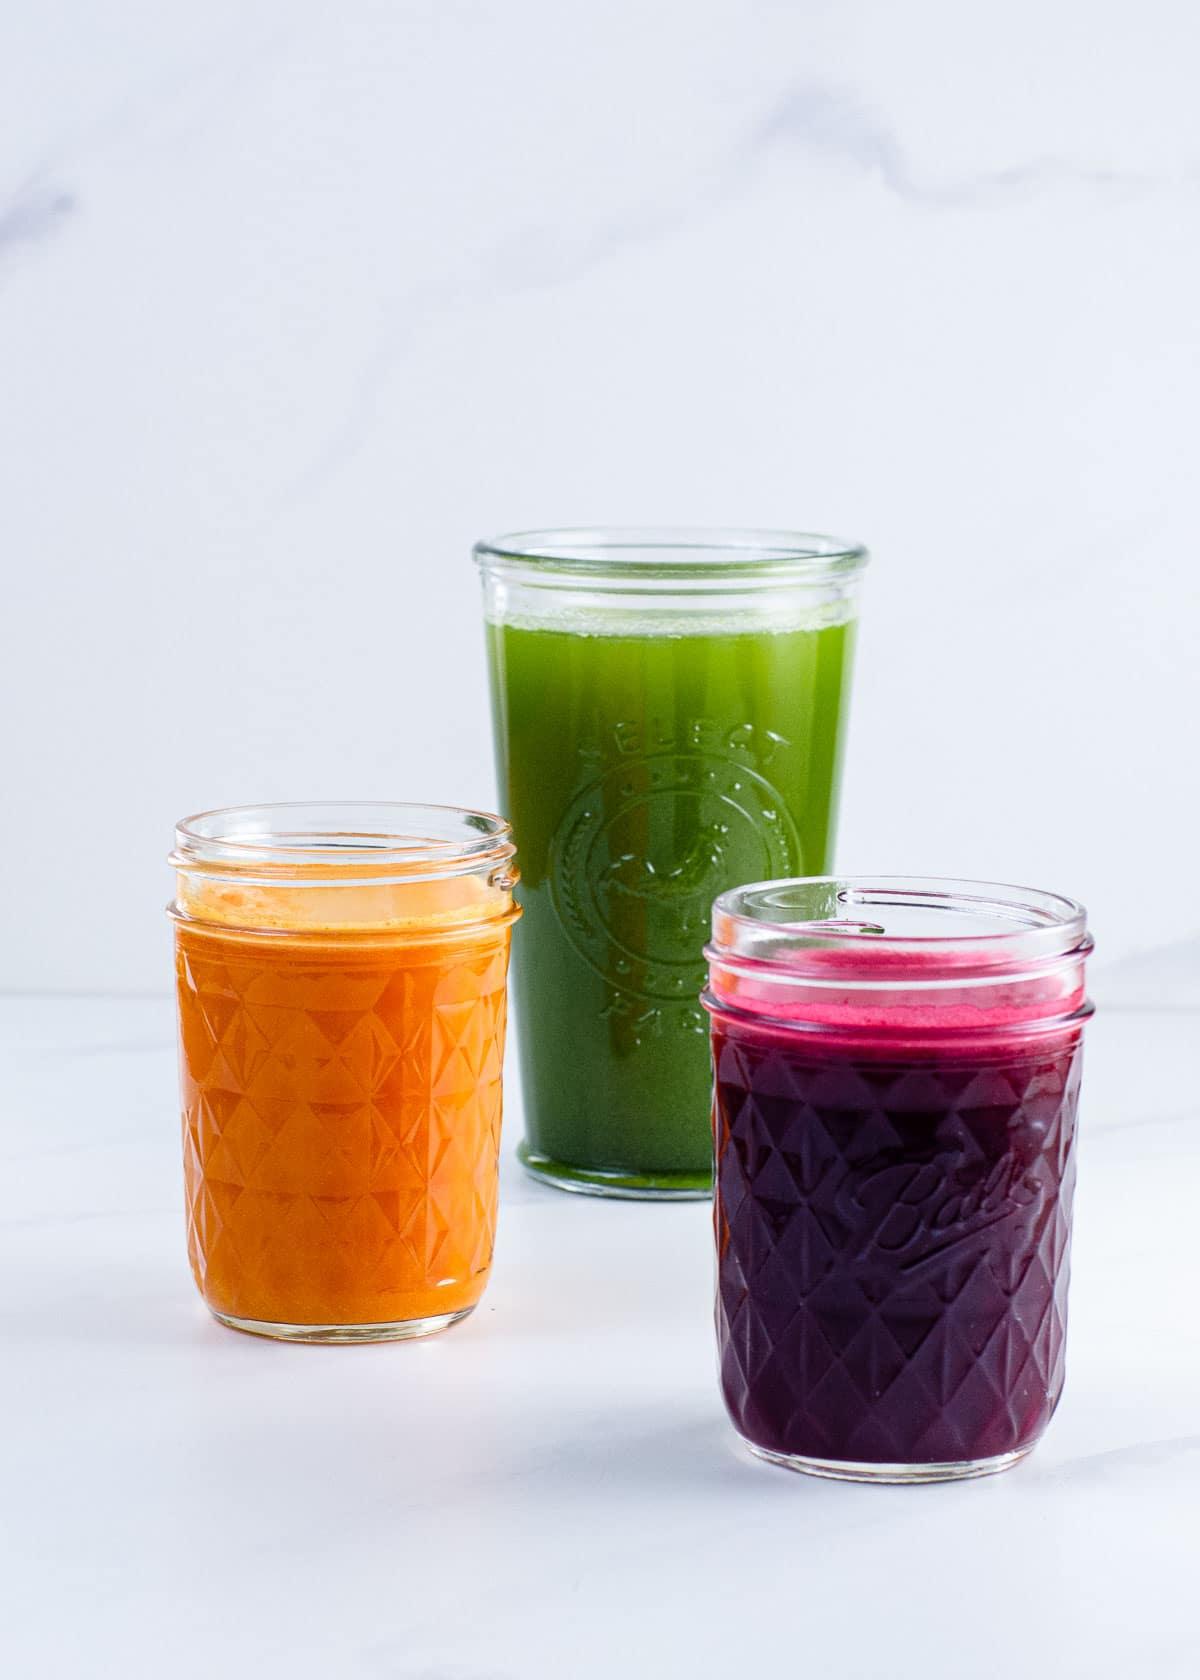 Juicing fo beginners (green juice, beet juice, and a turmeric shot)